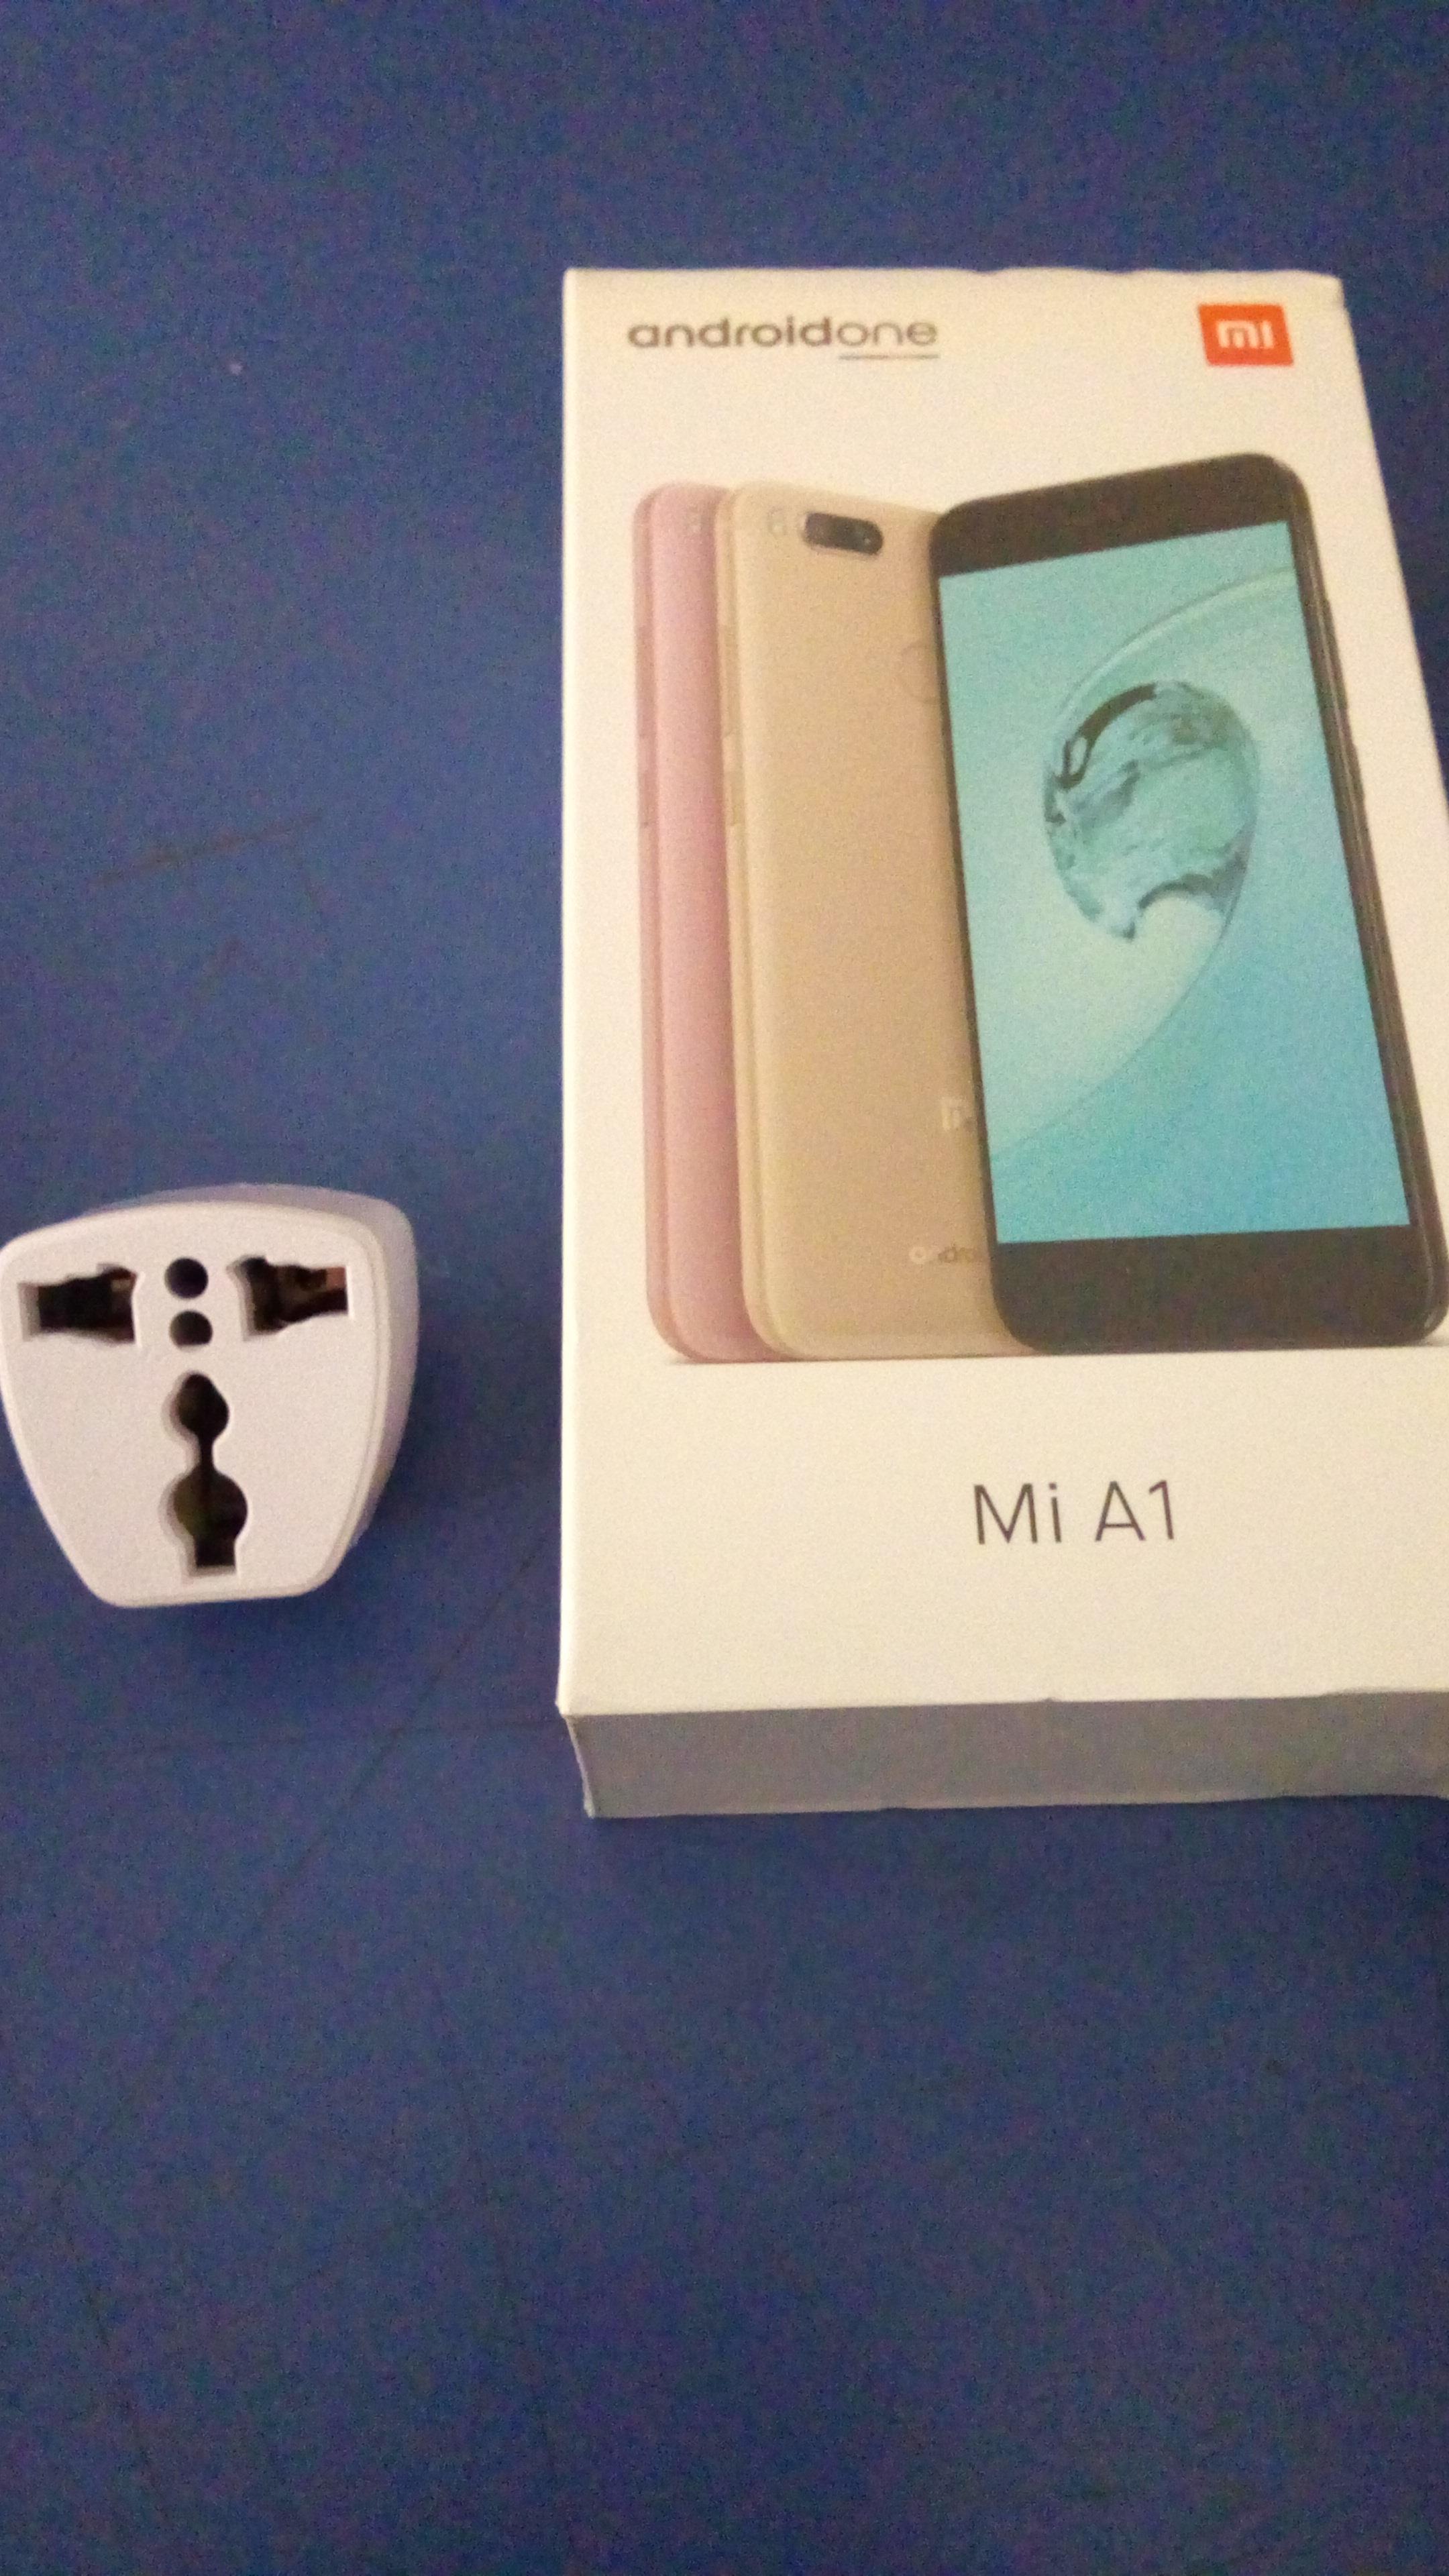 "line Shop Global Version Xiaomi Mi A1 MiA1 Android 8 0 Mobile Phone 4GB 64GB Snapdragon 625 Octa Core 5 5"" 1080P Dual Camera 12 0MP FCC CE"